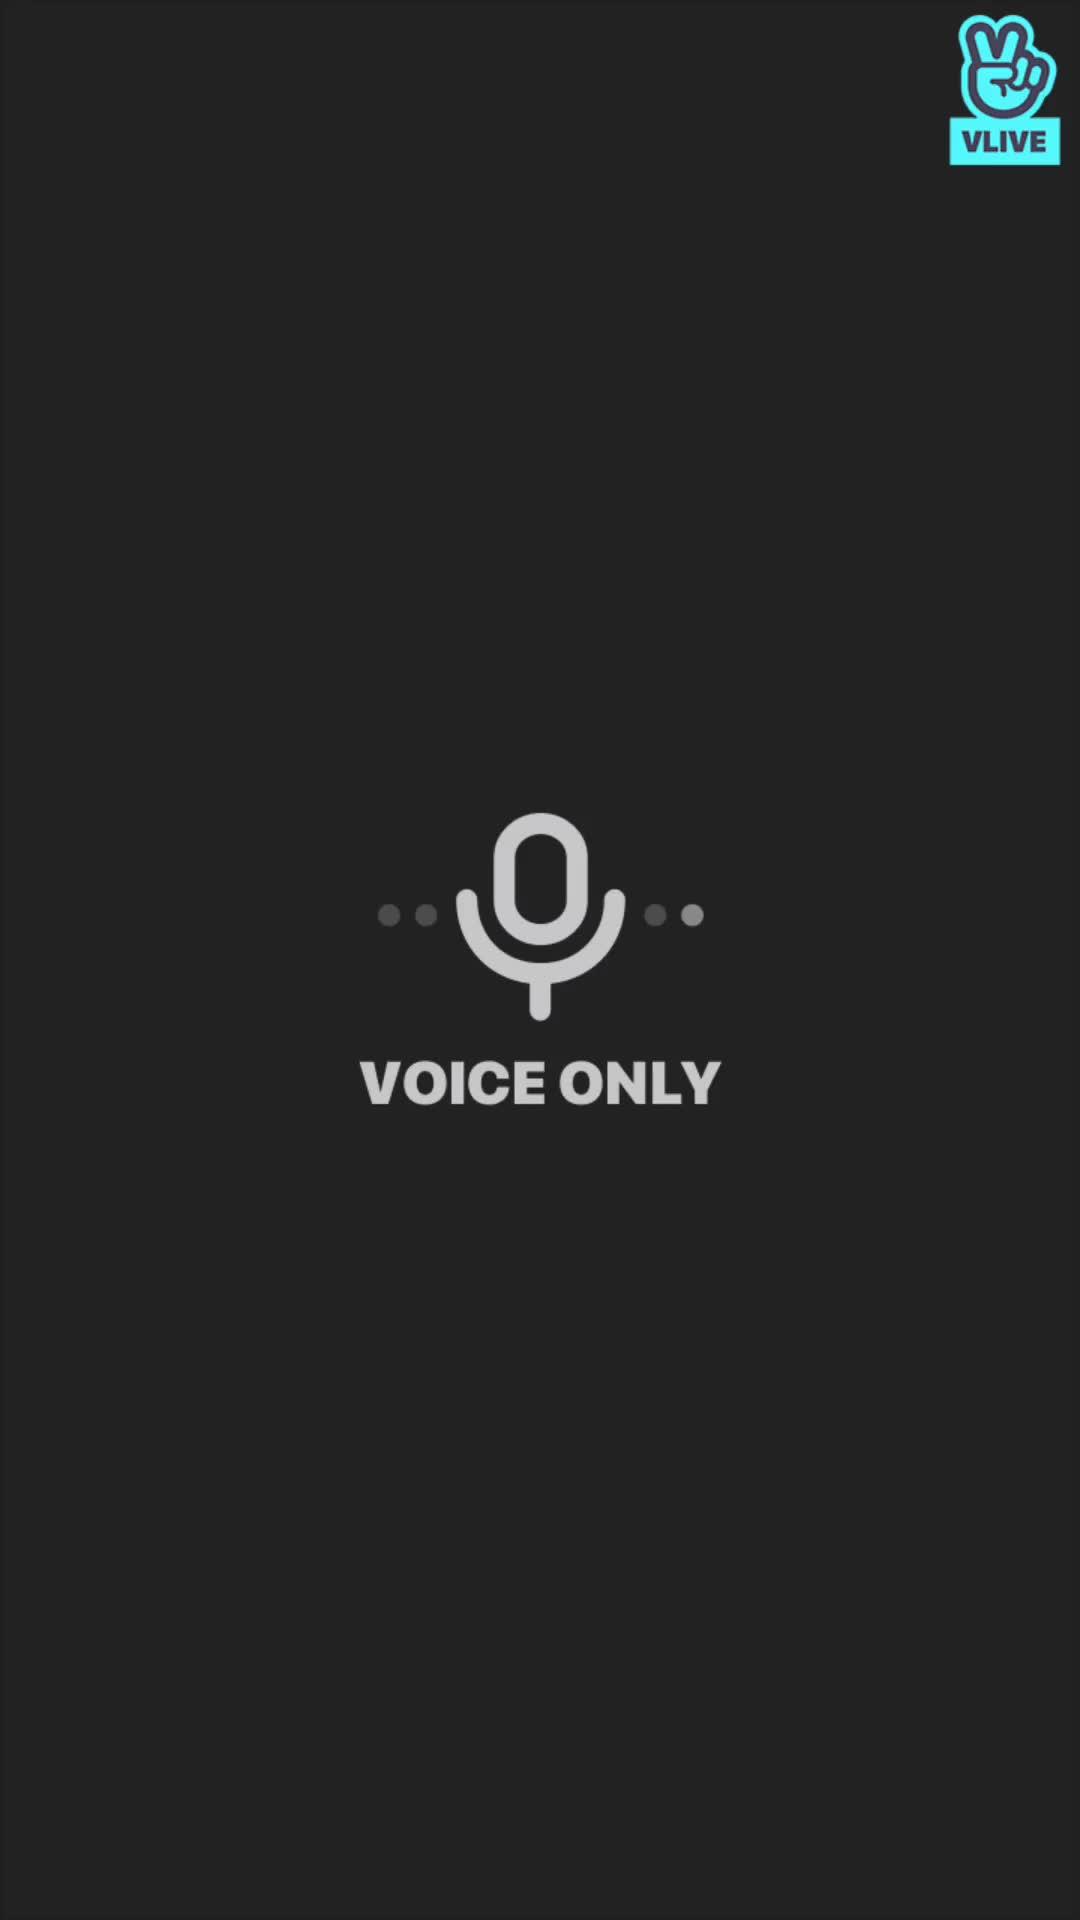 [RADIO] 캐럿들 귀대귀대 #74 호랑이의 청각